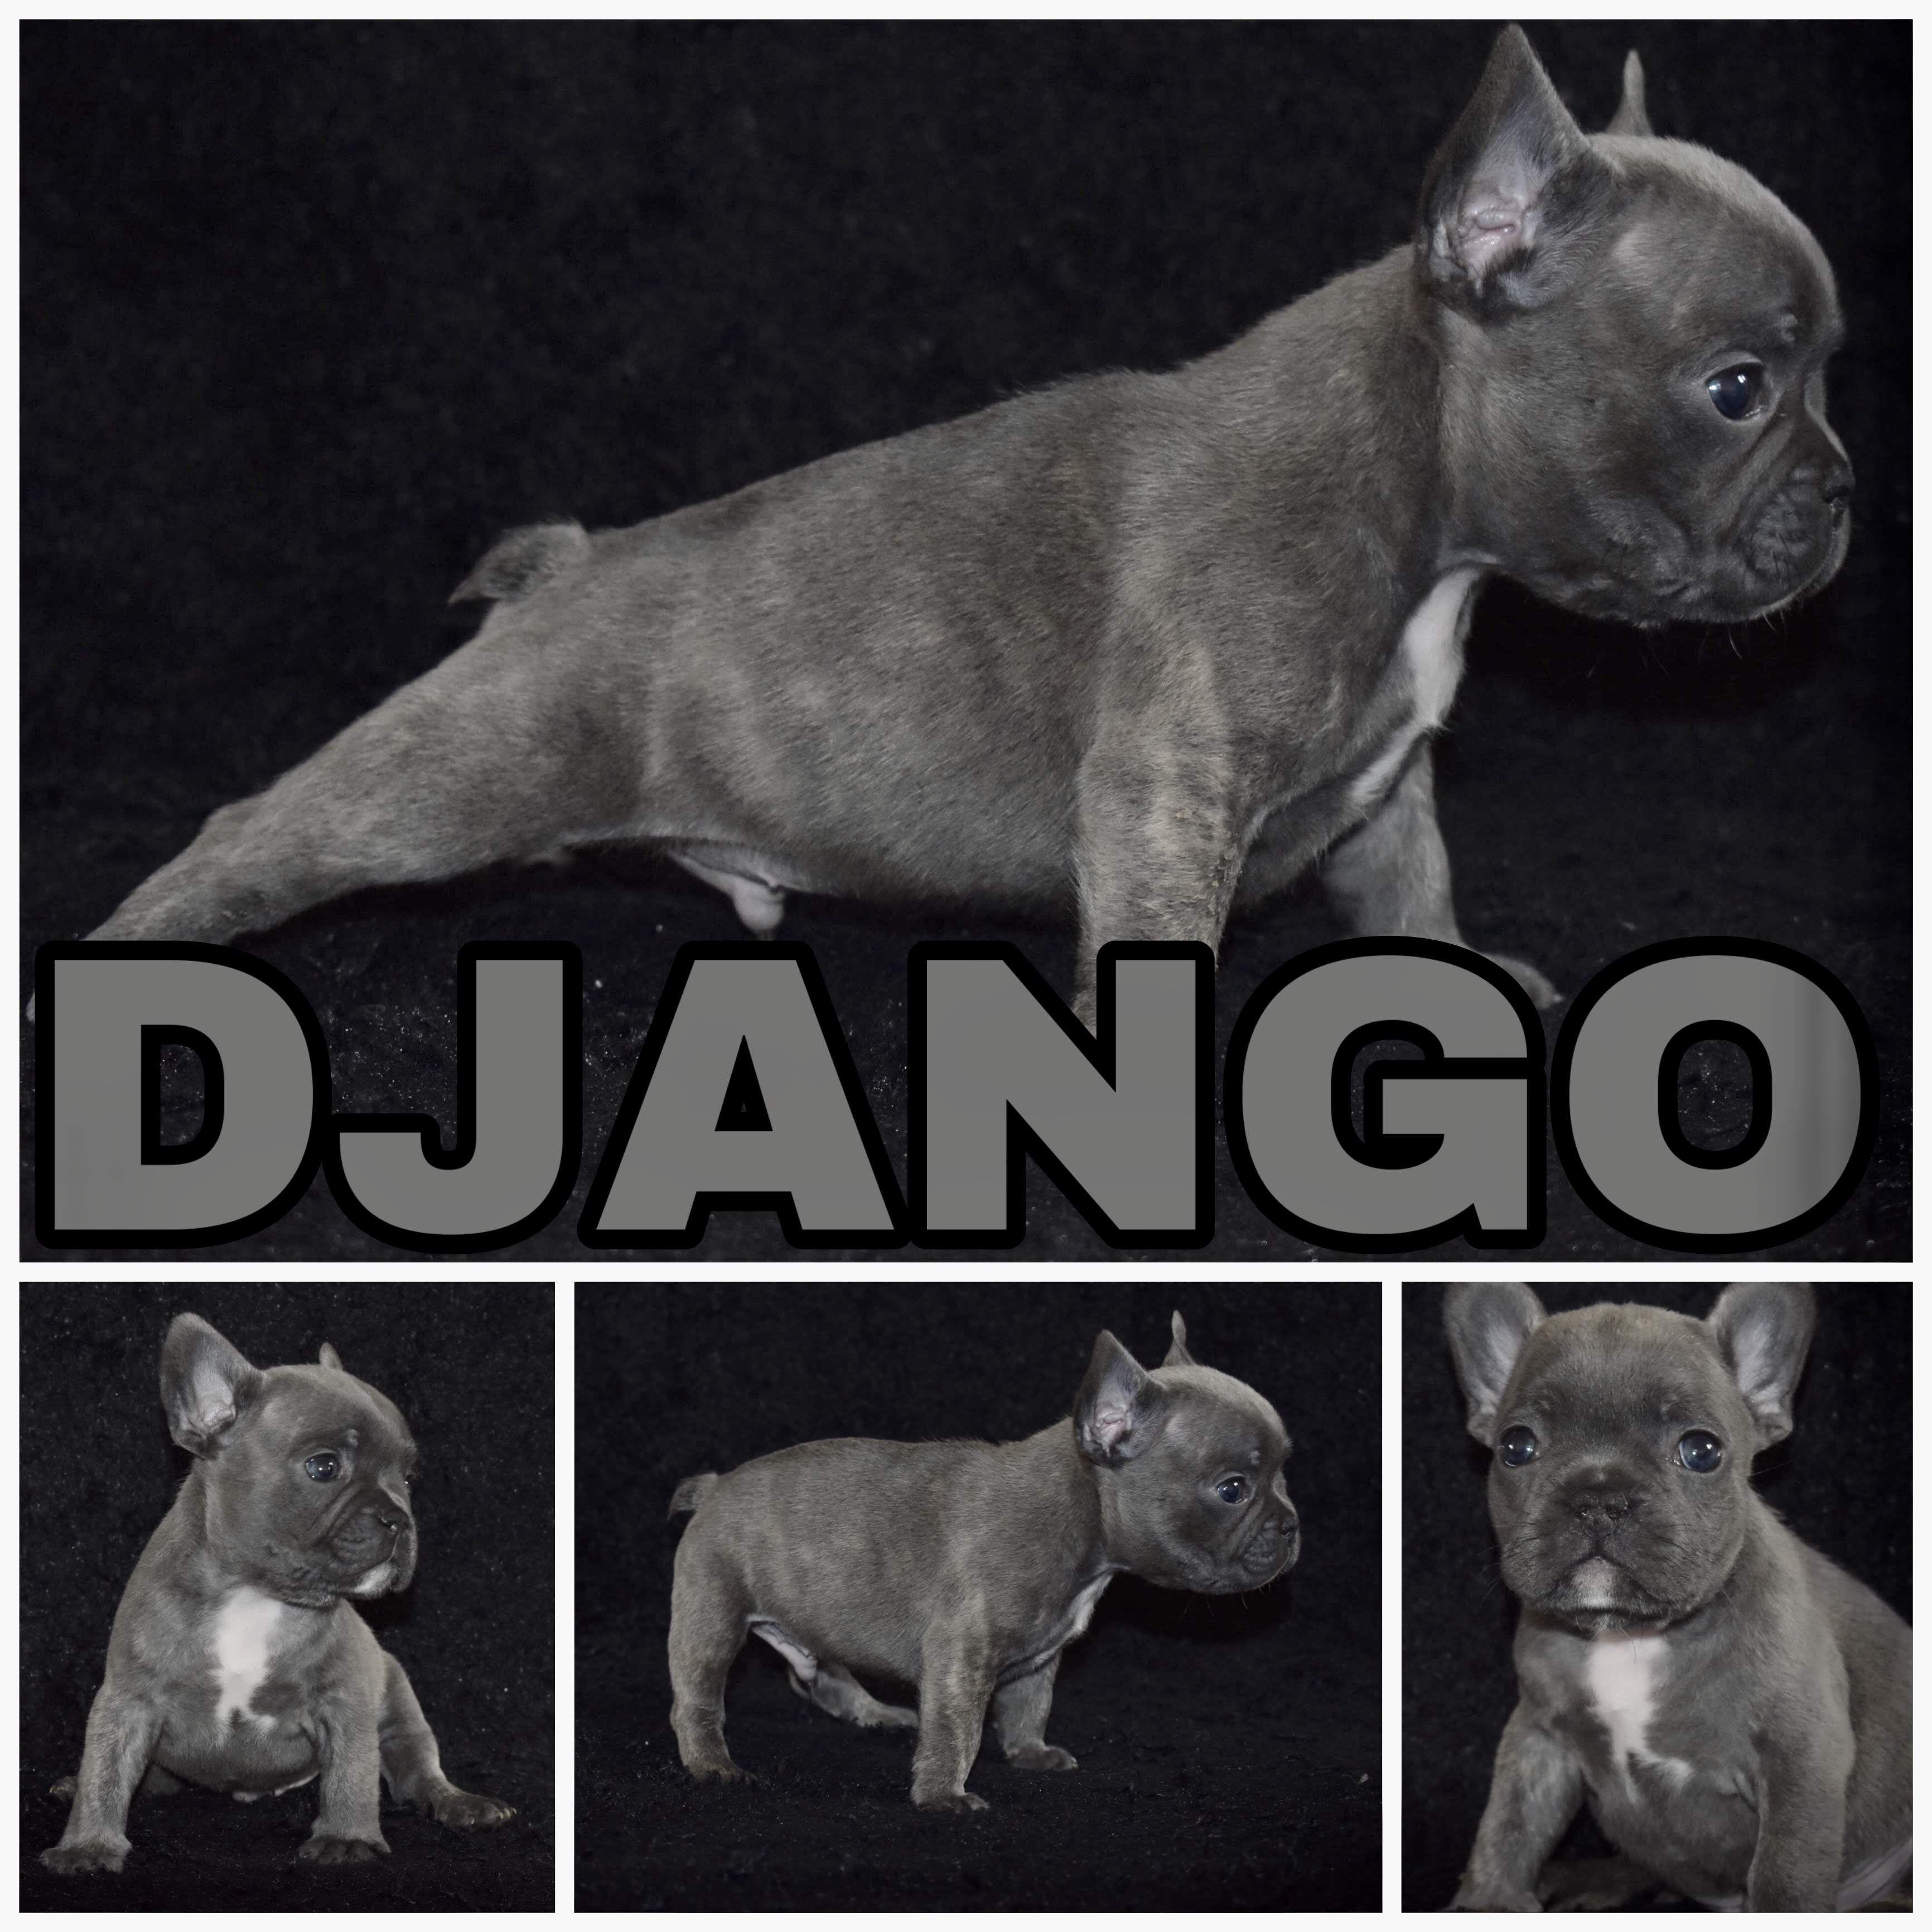 Django a male French Bulldog from Rosharon, Texas near